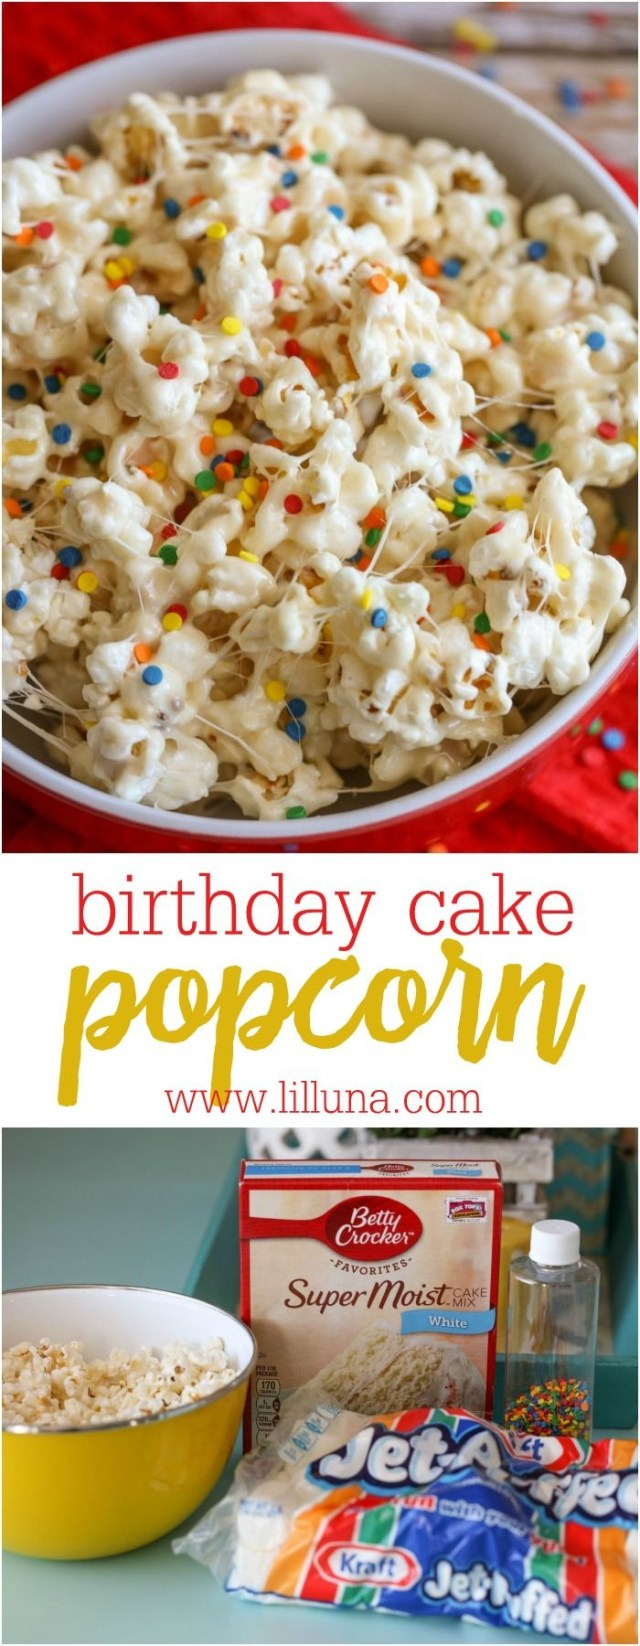 Birthday Cake Popcorn Birthday Cake Popcorn Rezept Dezignparty Pinterest Desserts